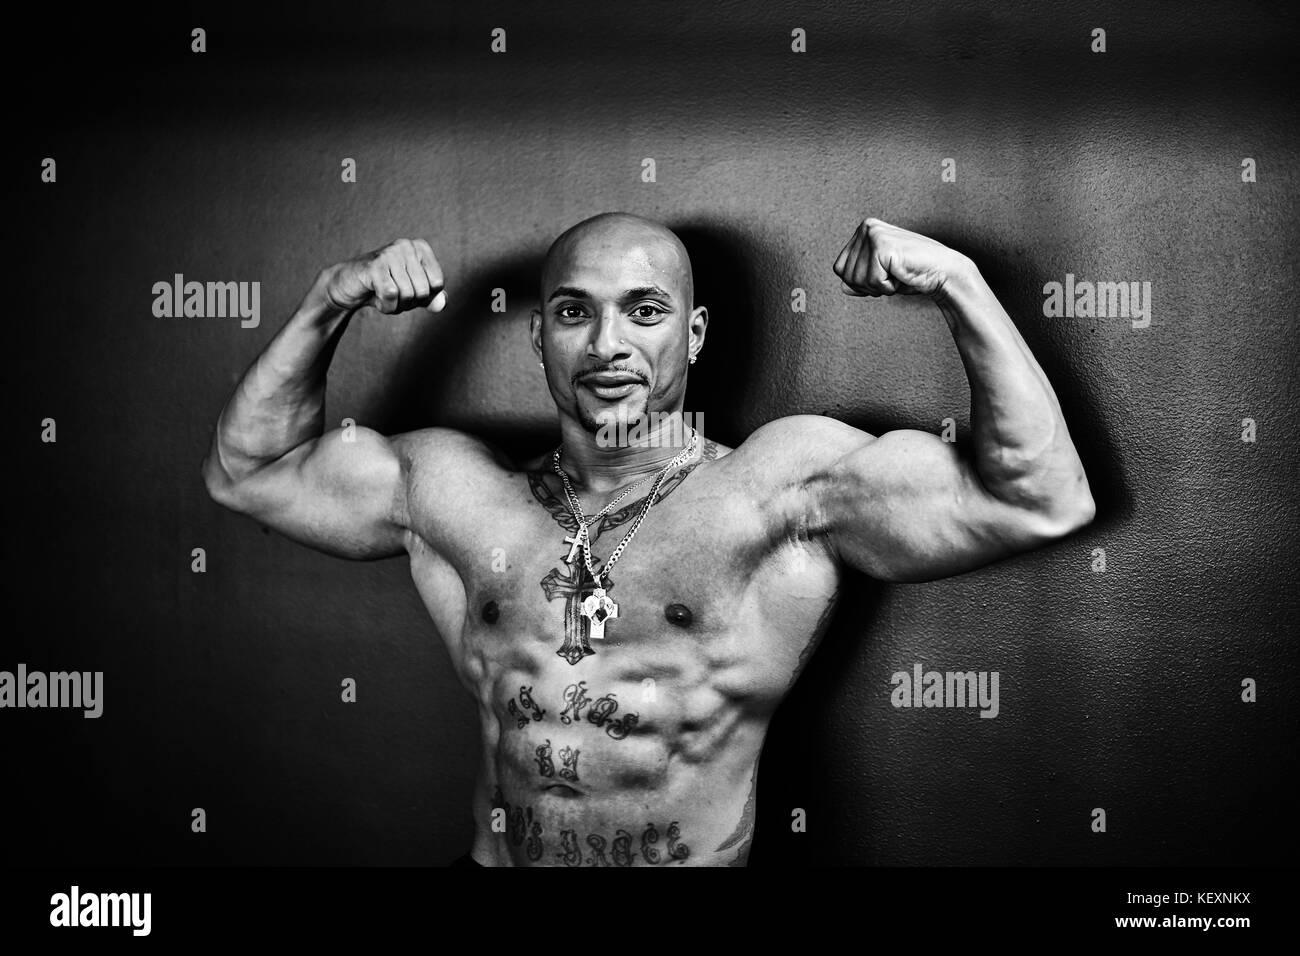 Black and white studio portrait of shirtless bodybuilder flexing muscles, Taunton, Massachusetts, USA - Stock Image